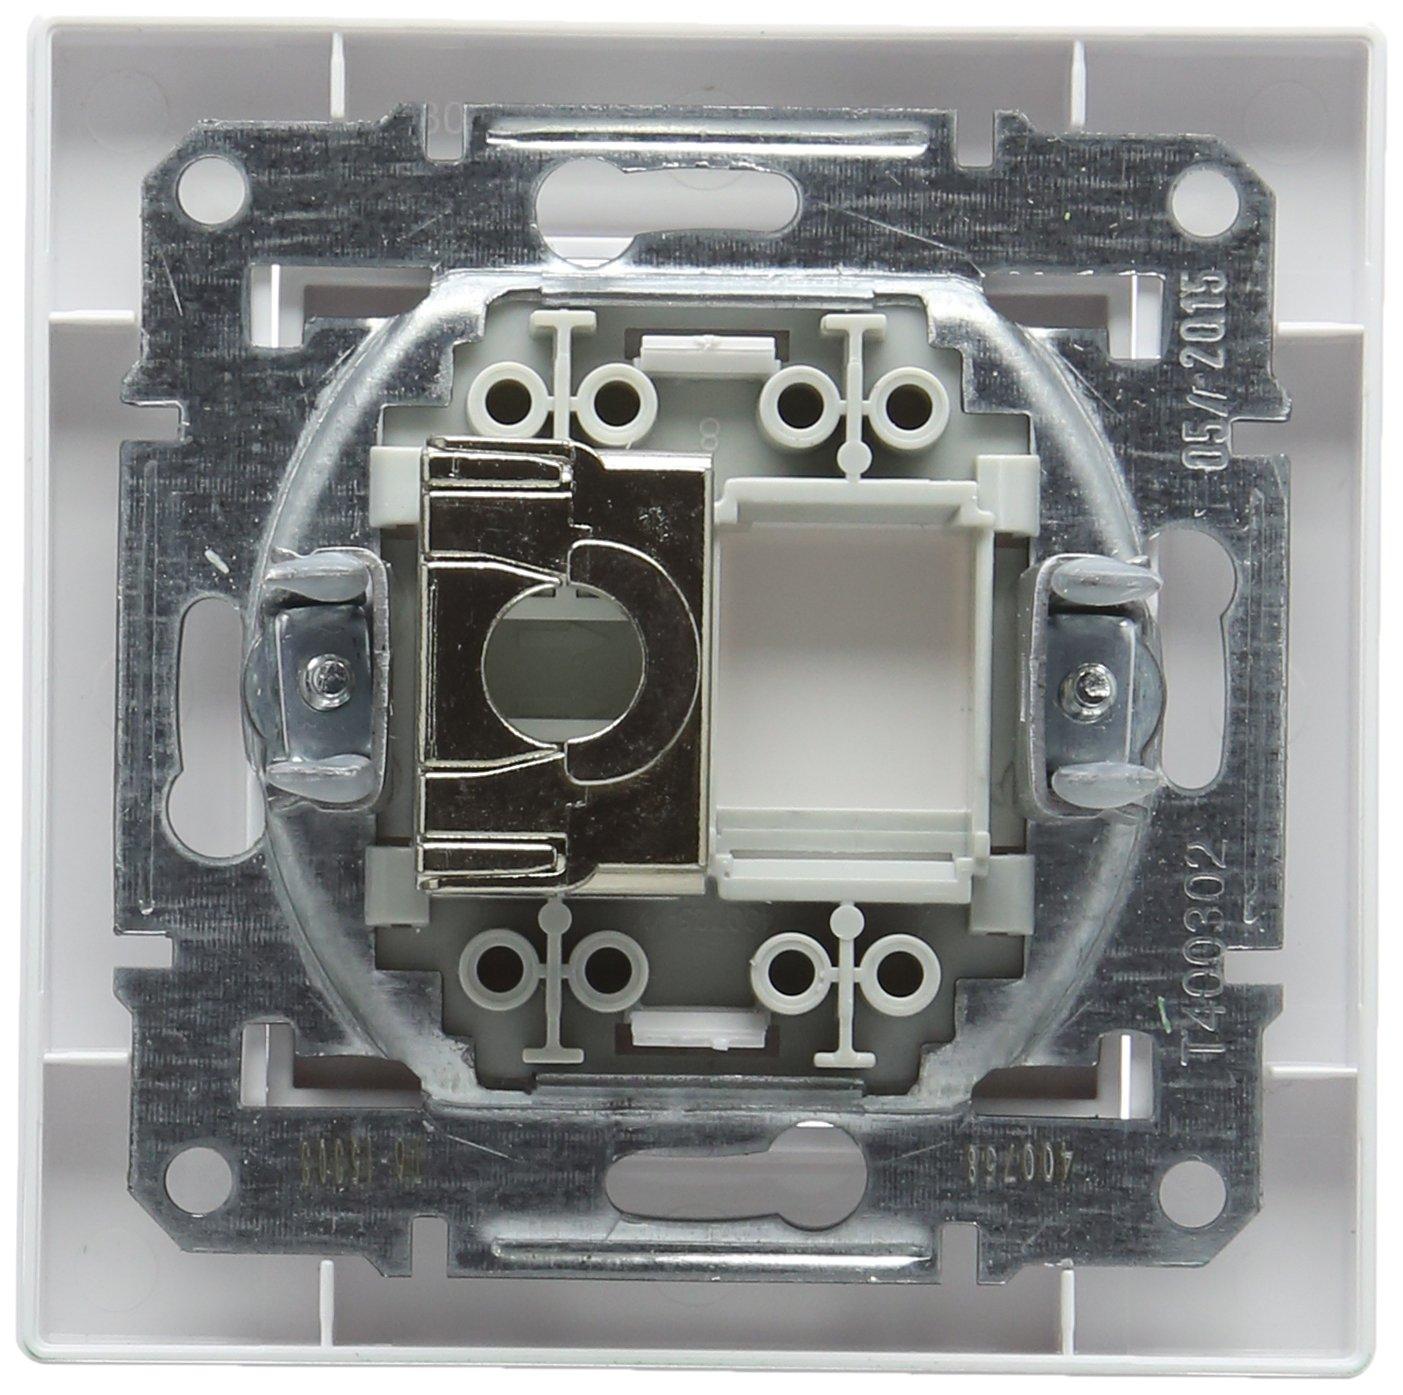 Schneider electric SC5EPH5003121 - Asfora rj45, komplettset ras: Amazon.es: Bricolaje y herramientas